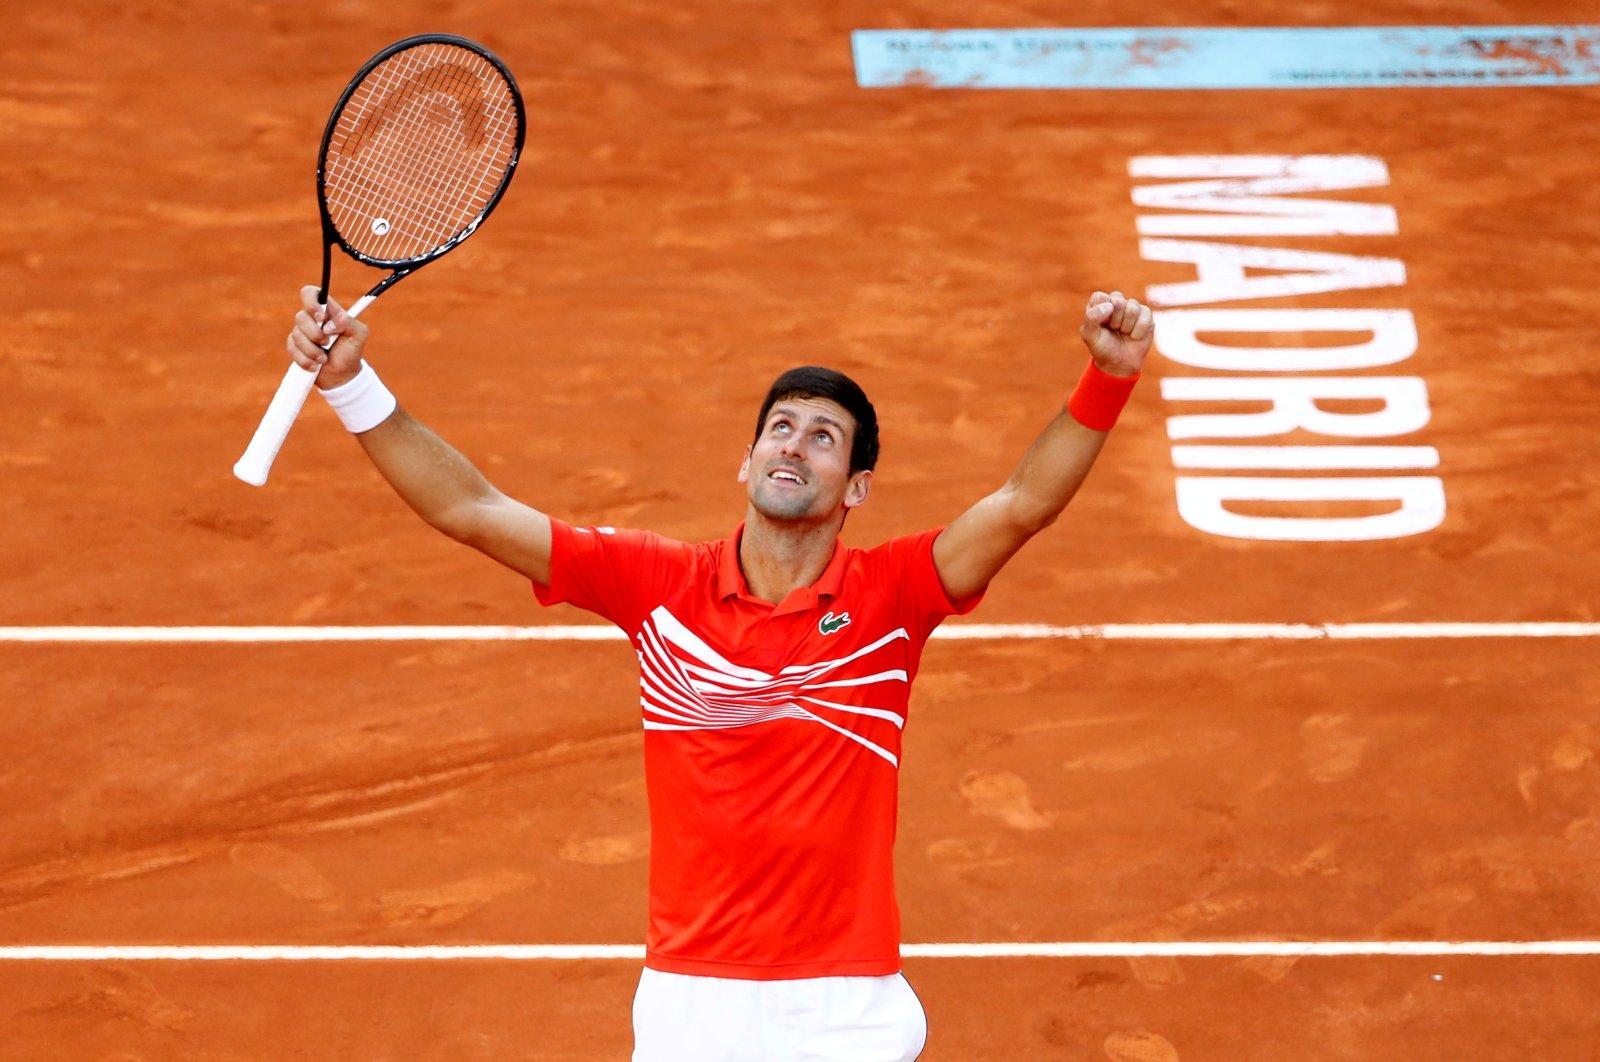 Serbia's Novak Djokovic celebrates winning the Madrid Open tennis tournament in Madrid, Spain, May 12, 2019. (Reuters Photo)